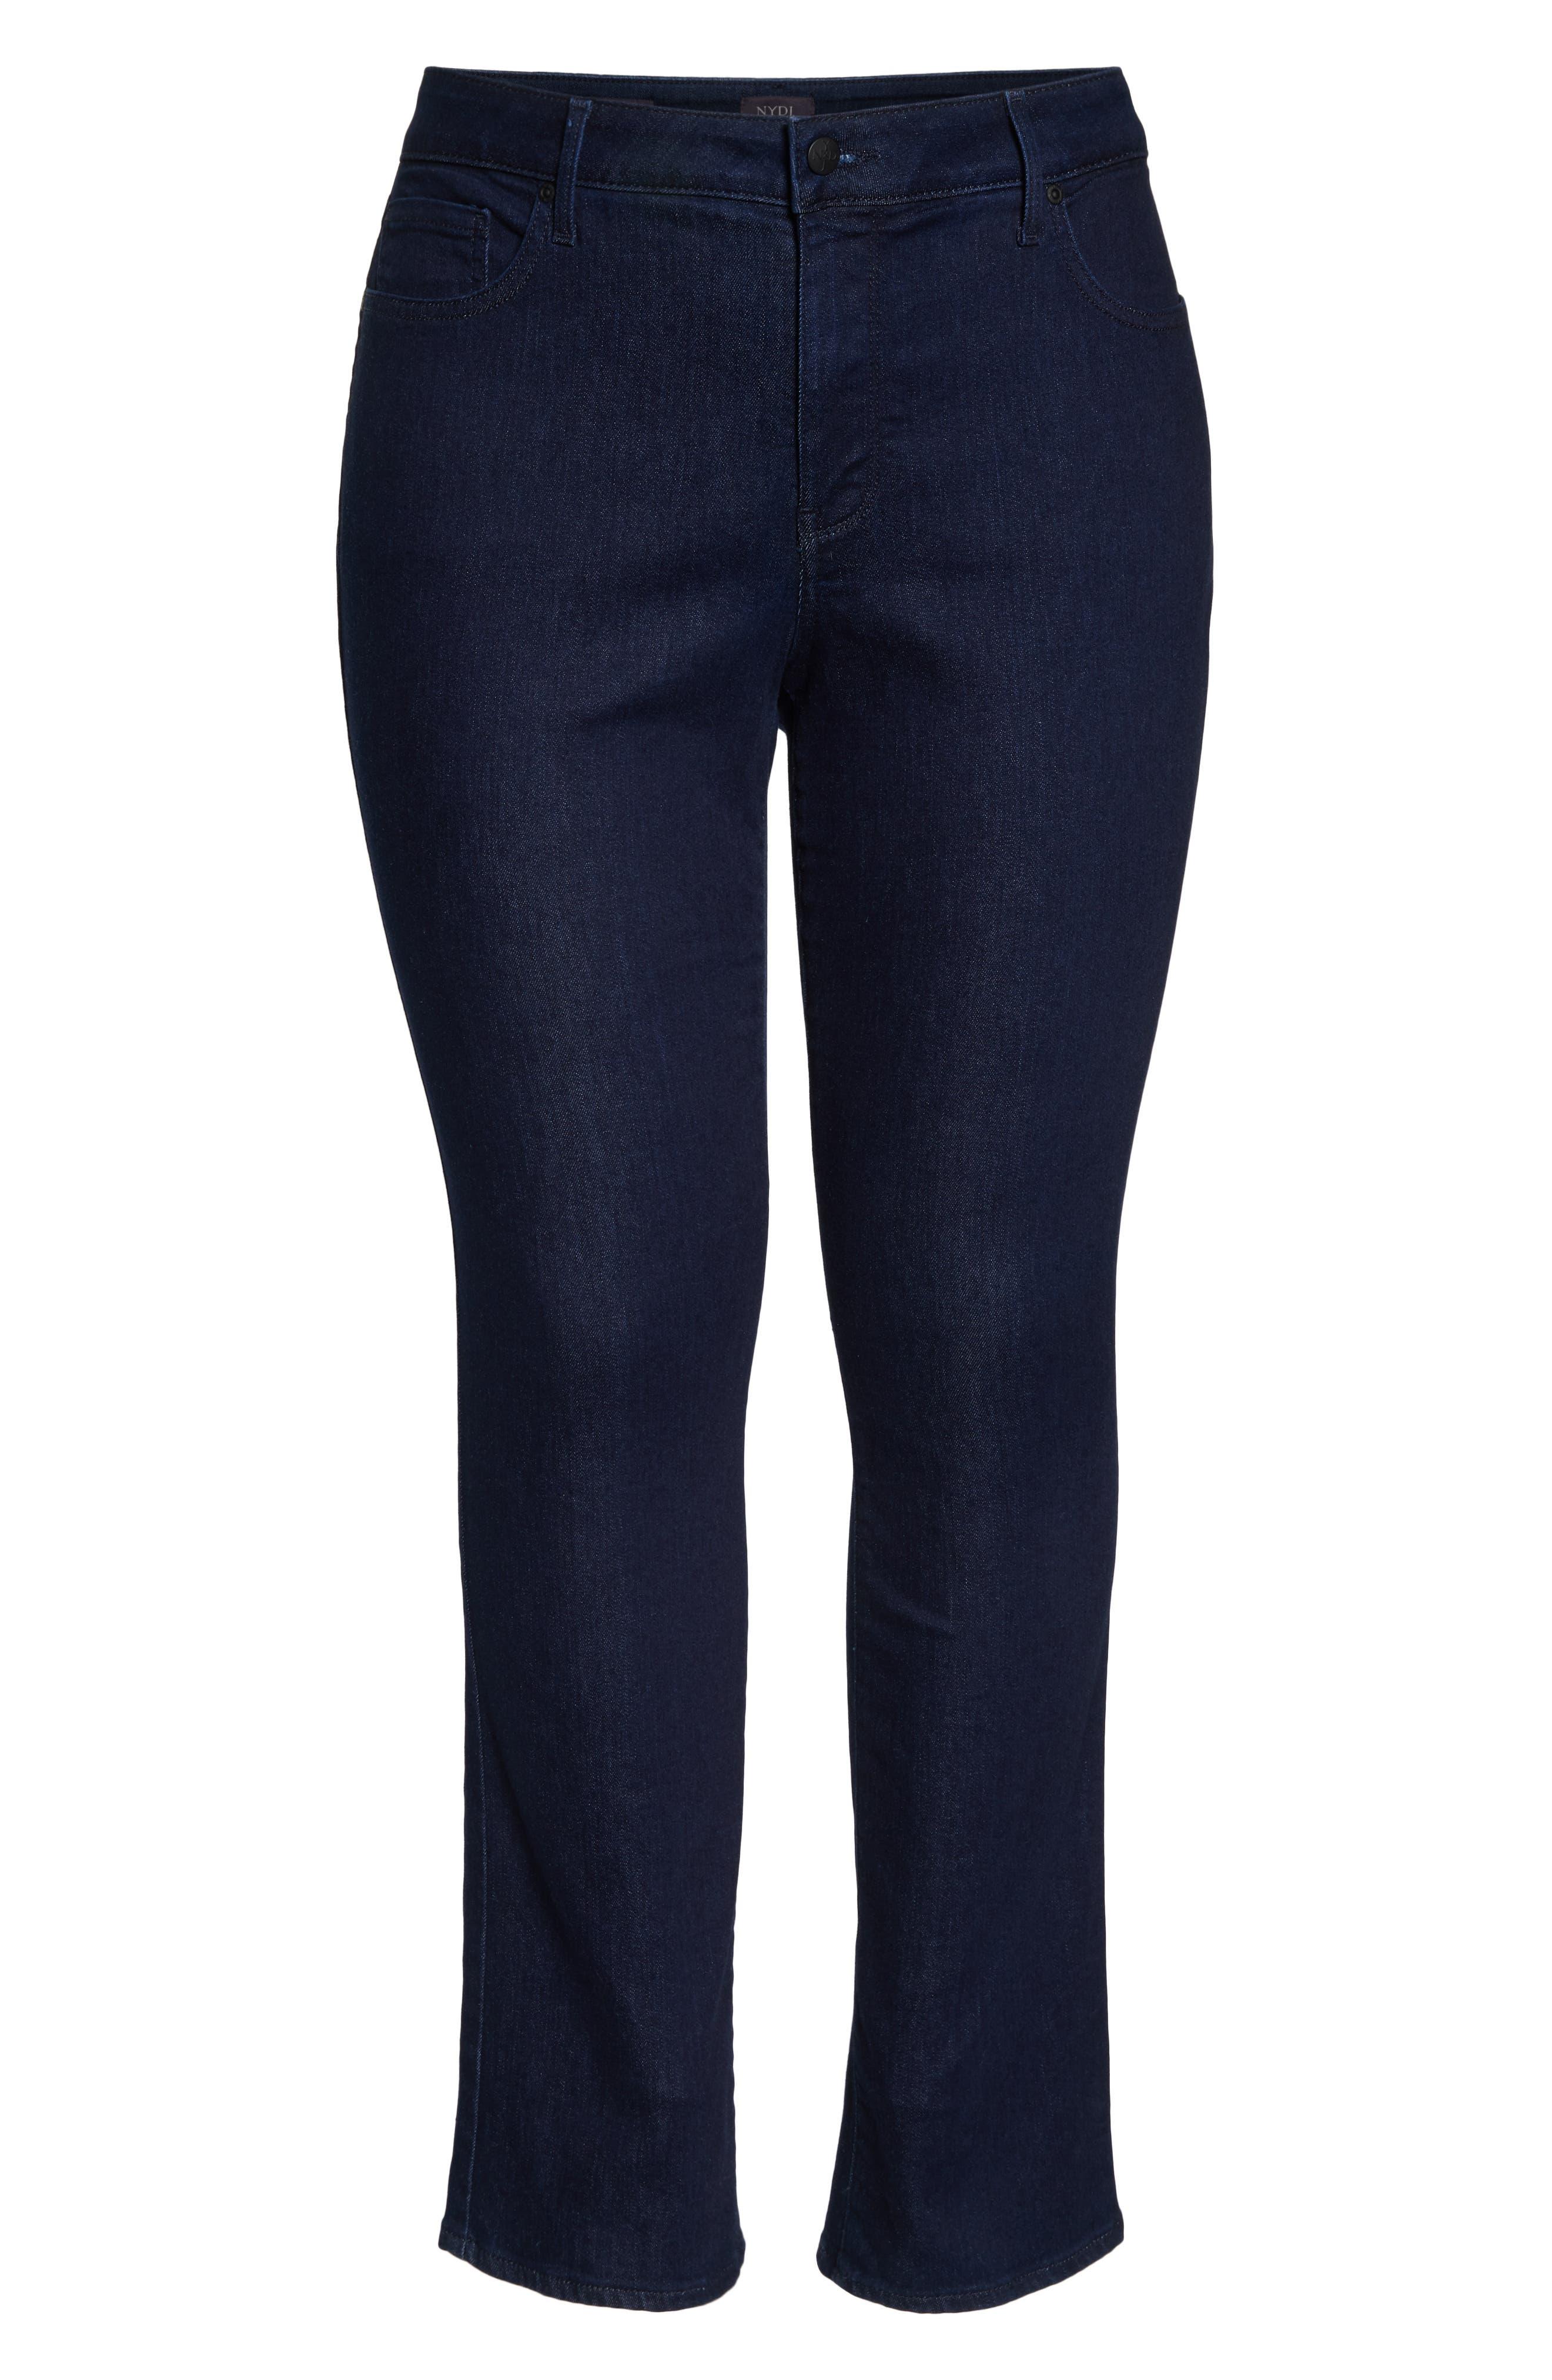 Marilyn High Rise Straight Leg Jeans,                             Alternate thumbnail 7, color,                             RINSE TONAL STITCH